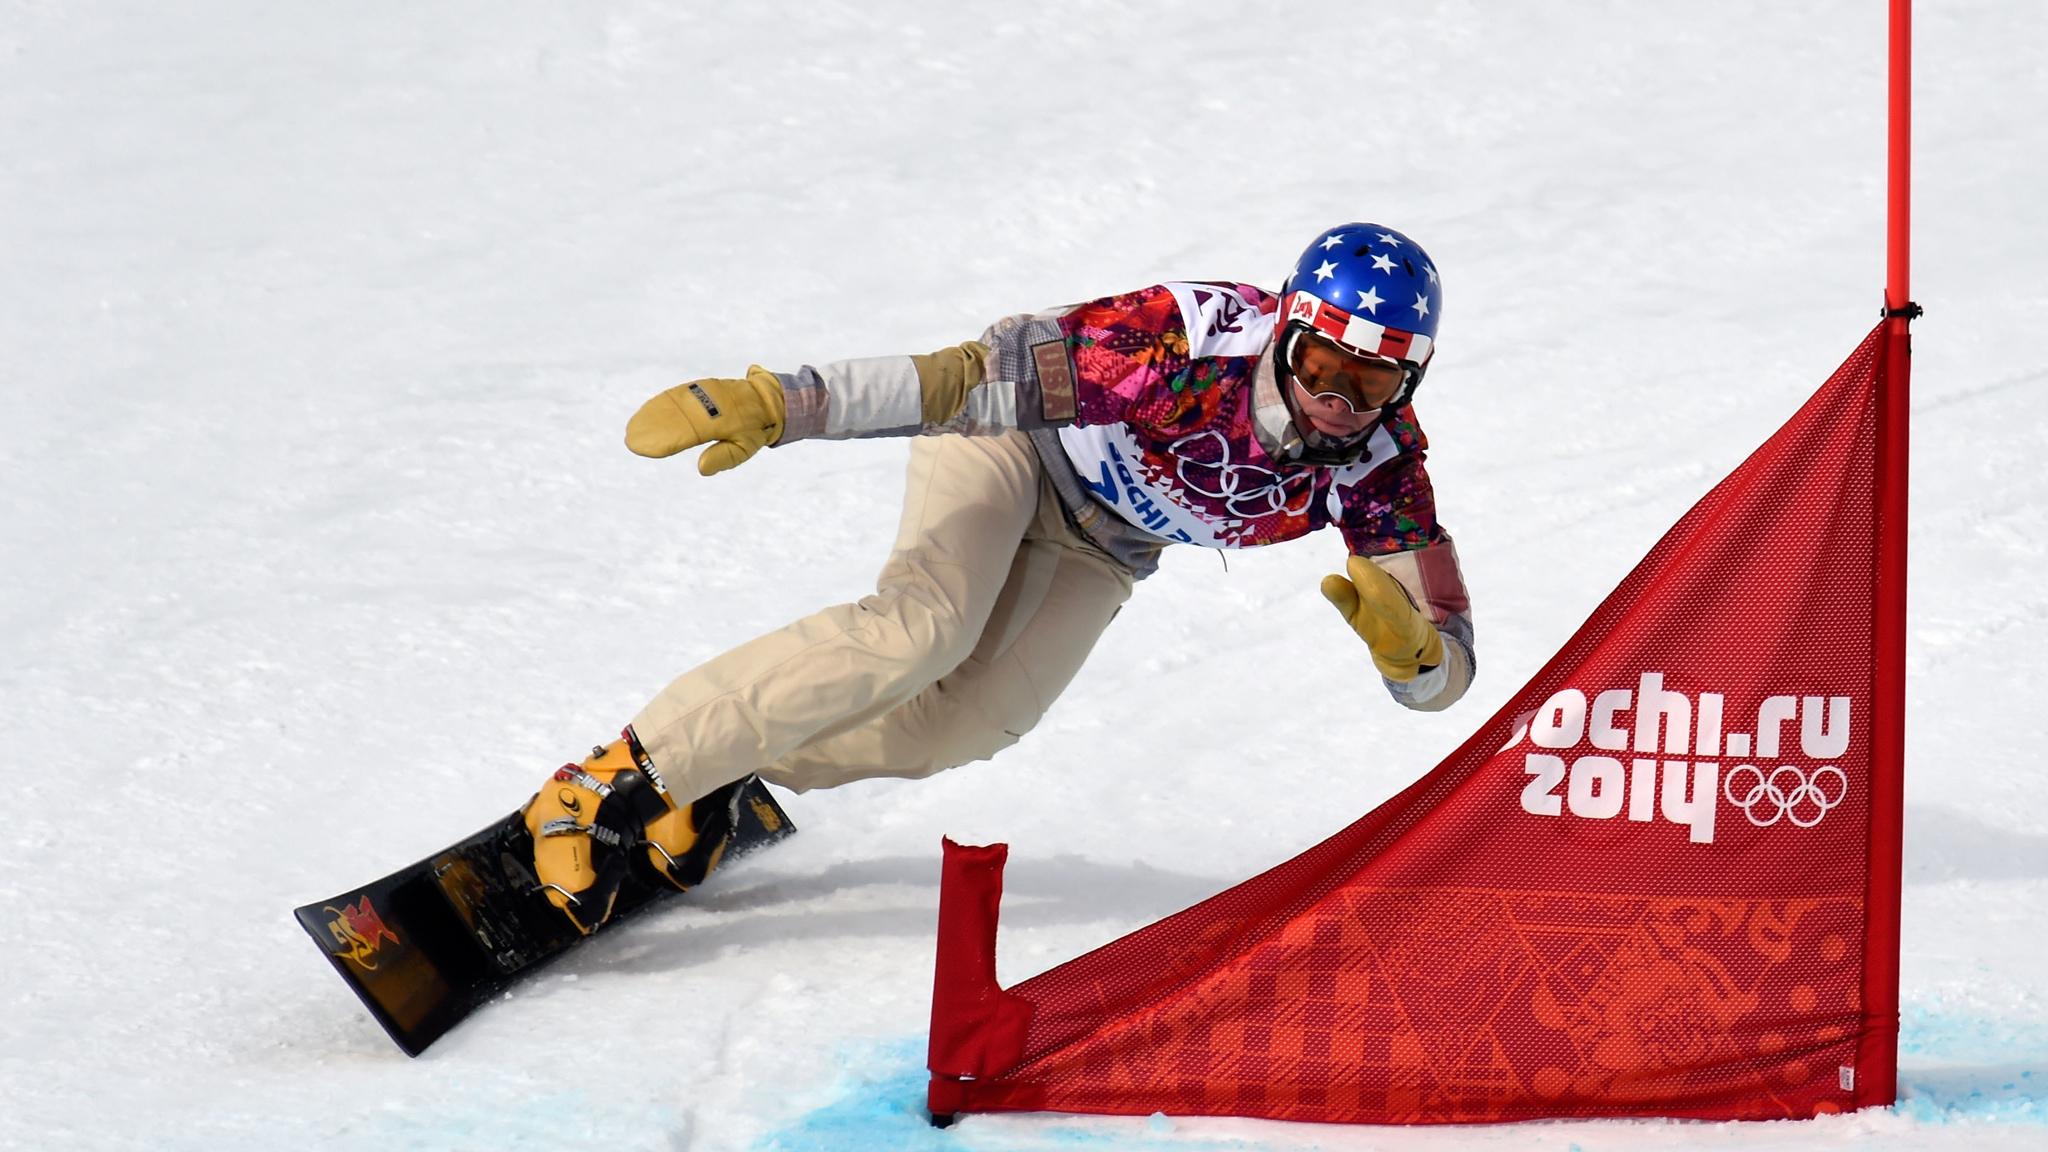 Justin Reiter: Last U.S. snowboarder competing in Sochi